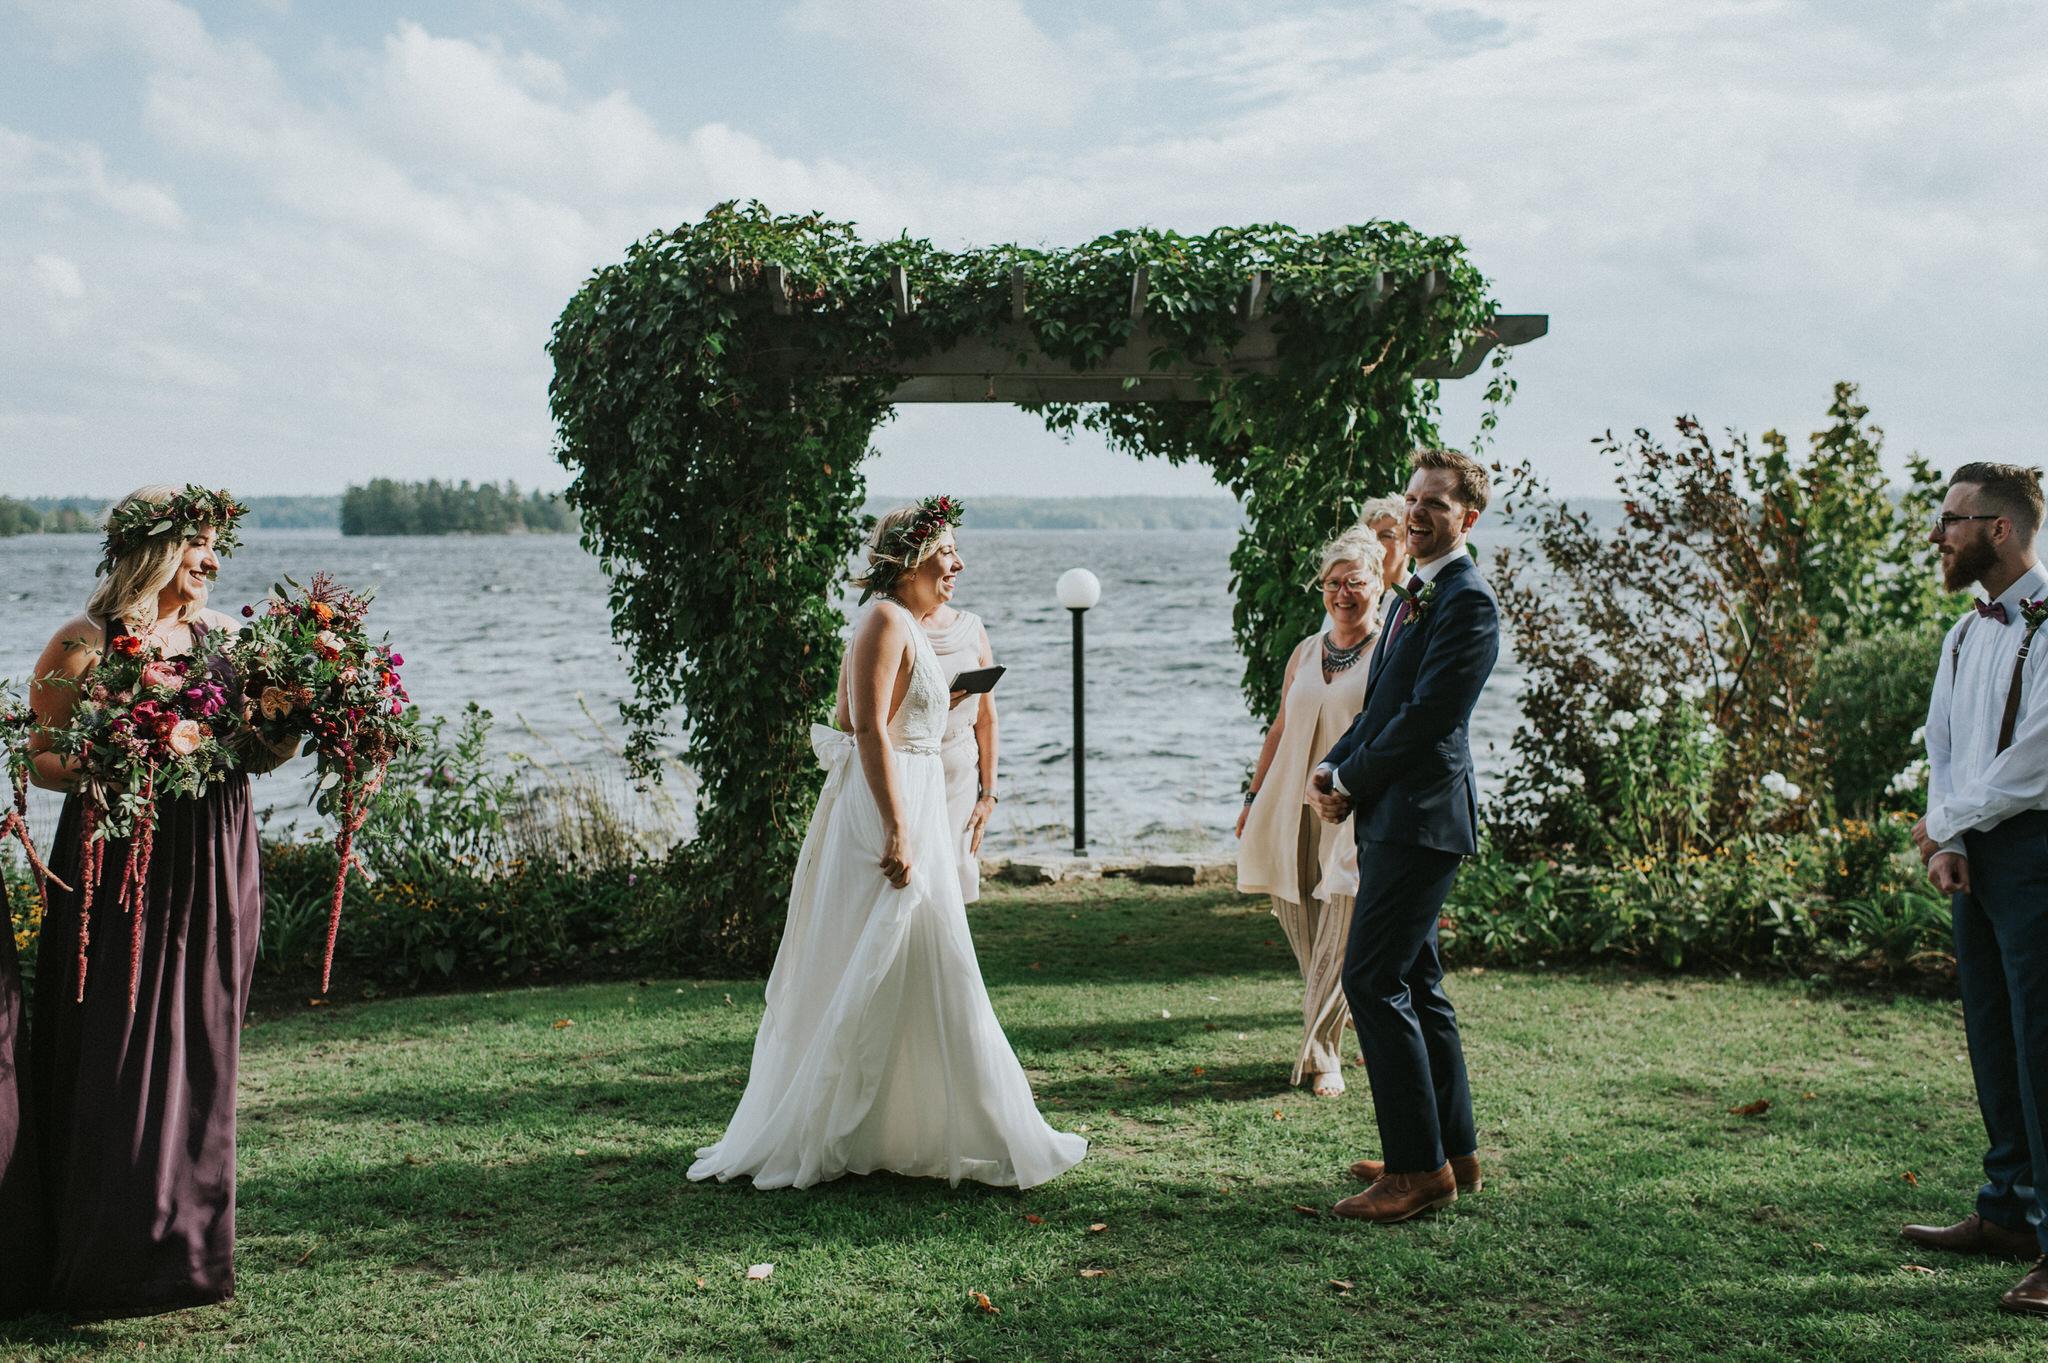 toronto wedding photography141.JPG